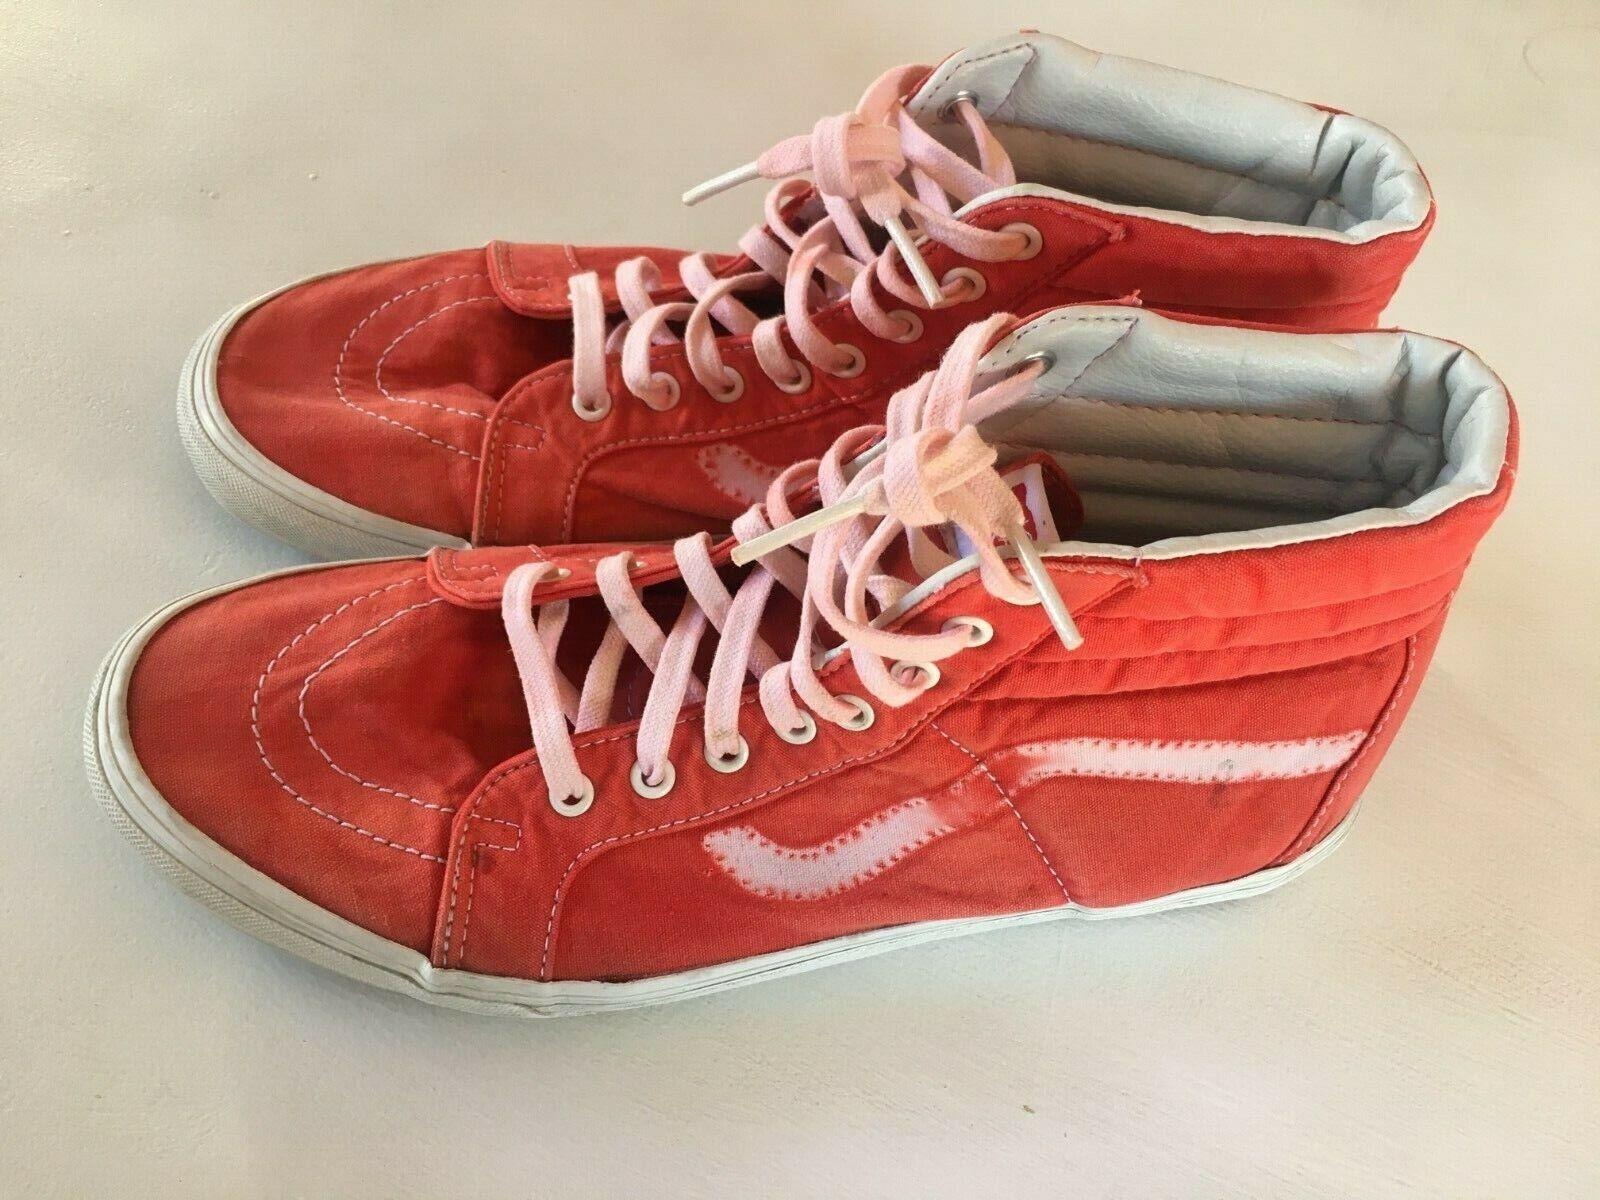 Men's Vans off The Wall Worlds Skateboard Tie Dye Hi Top Lace Up Sneakers 11.5